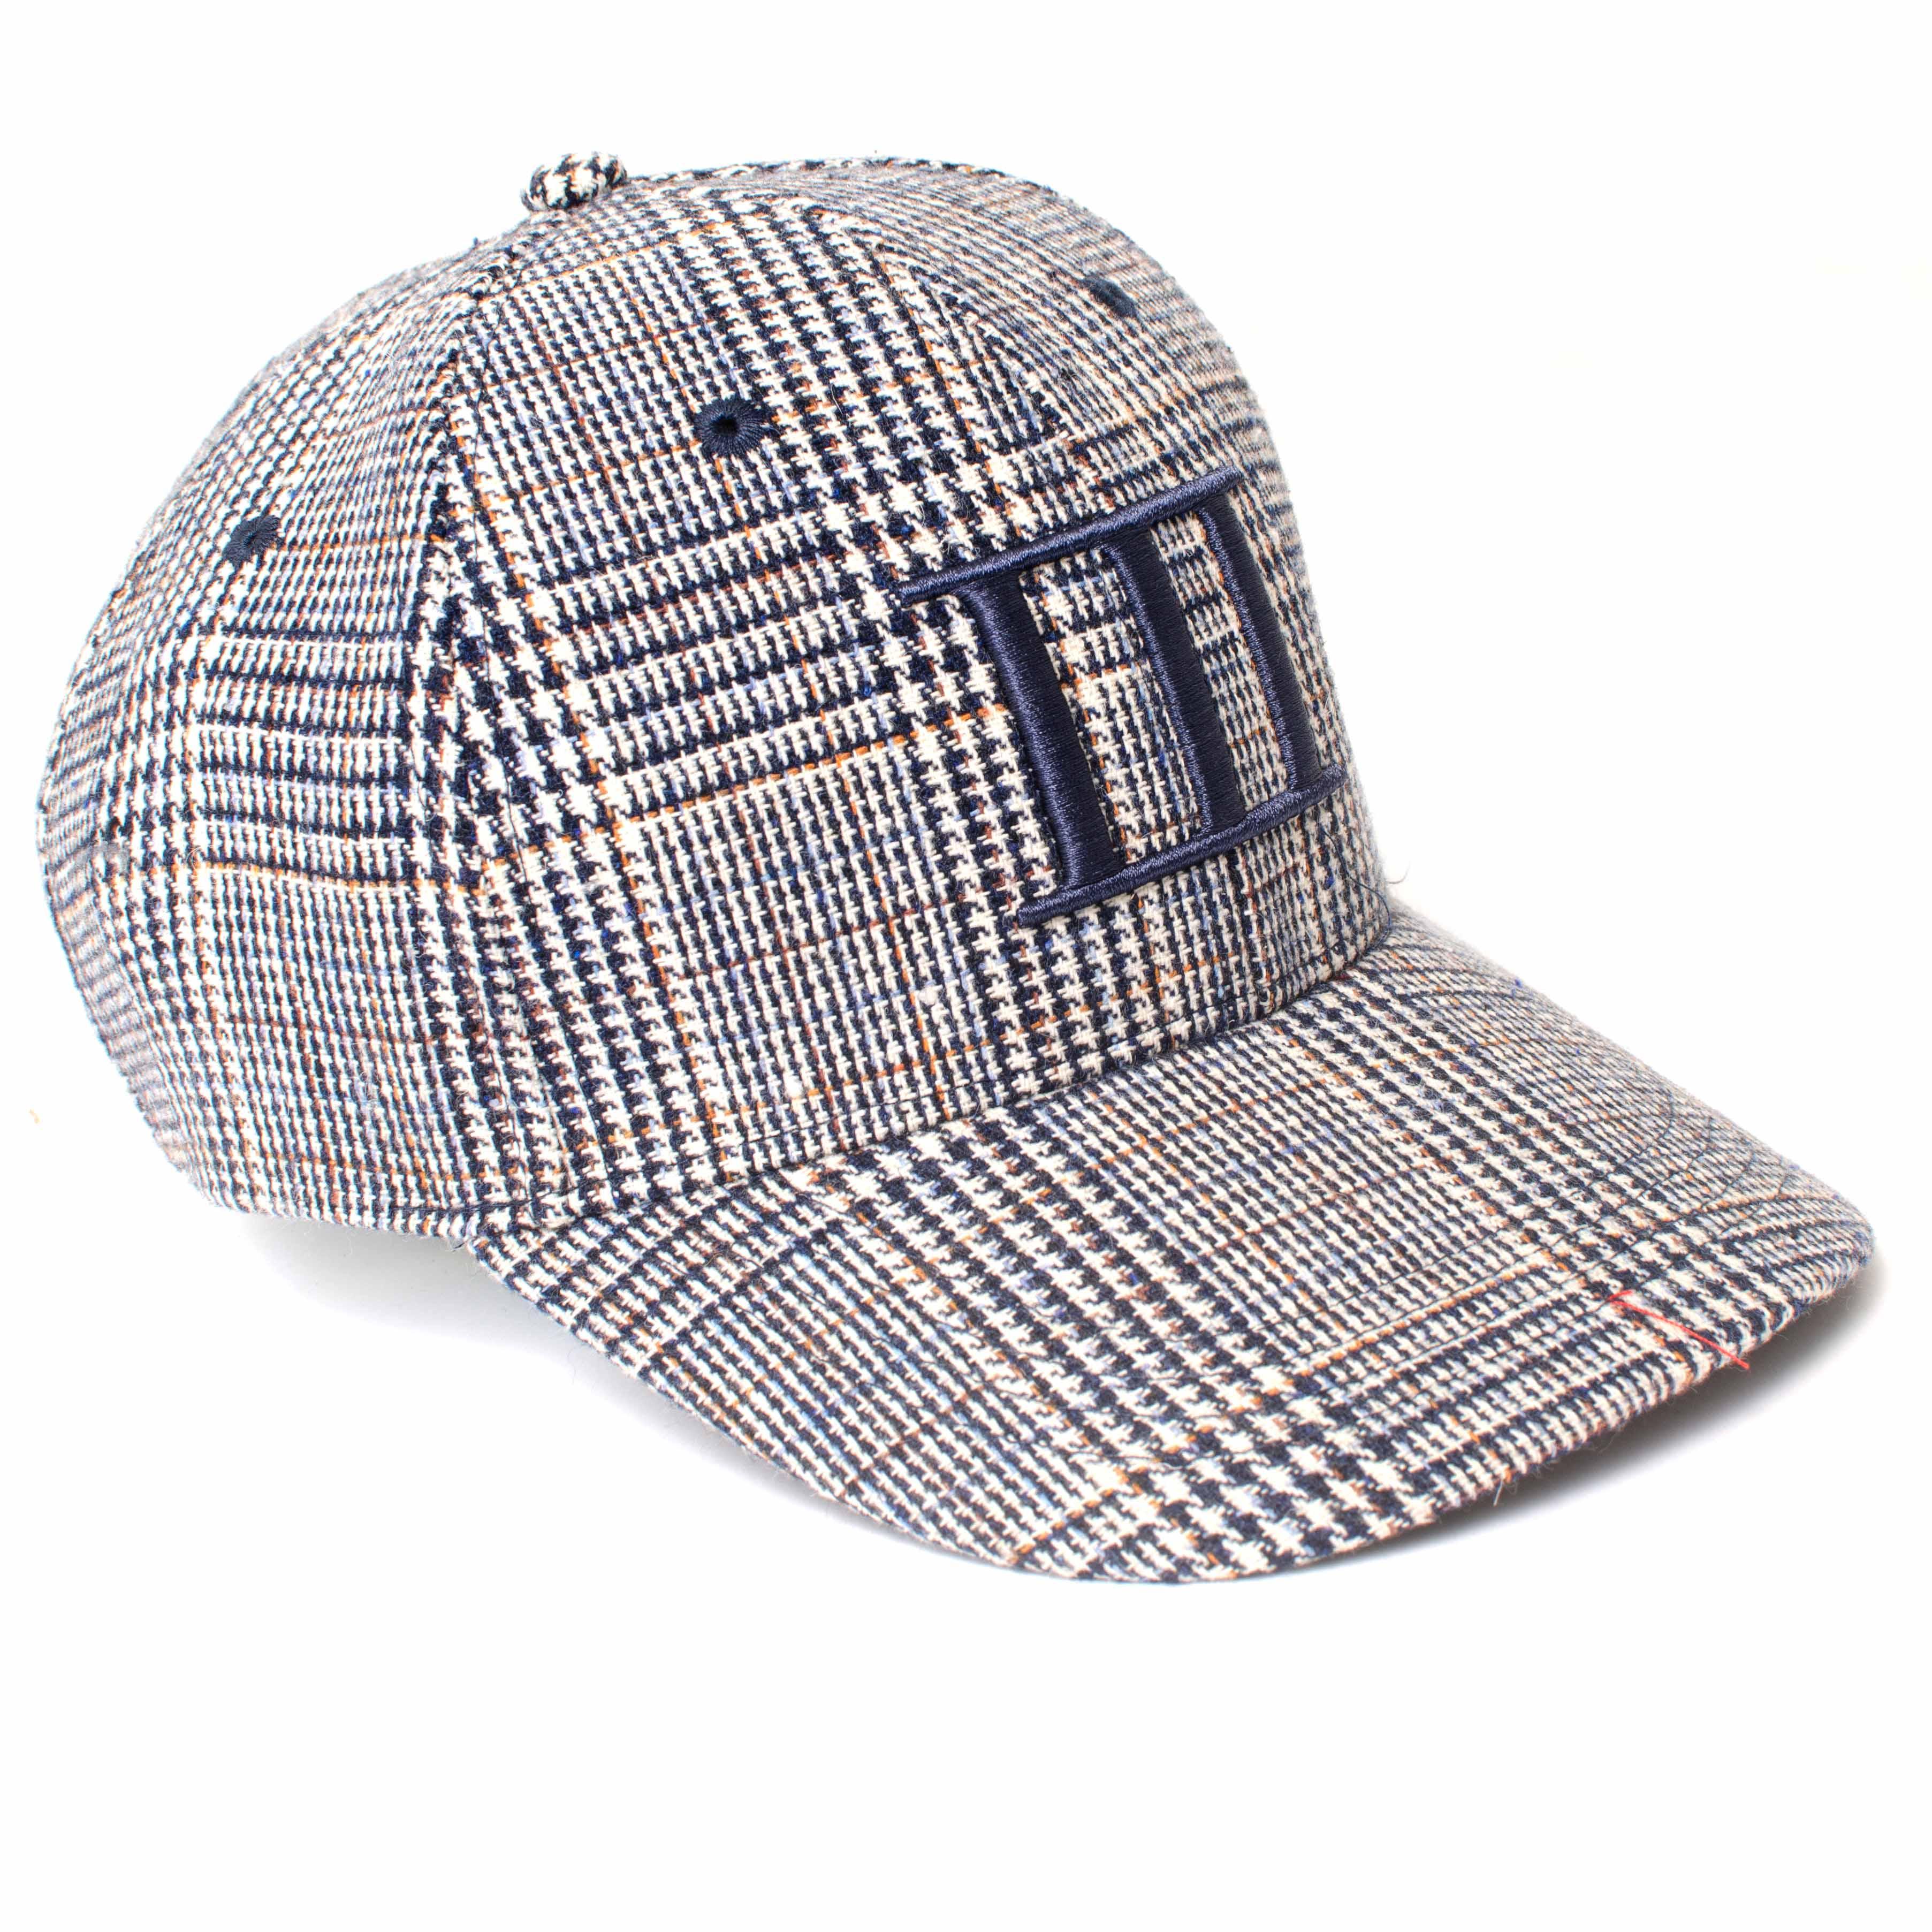 EVERTON   Navy pied-de-poule style baseball cap